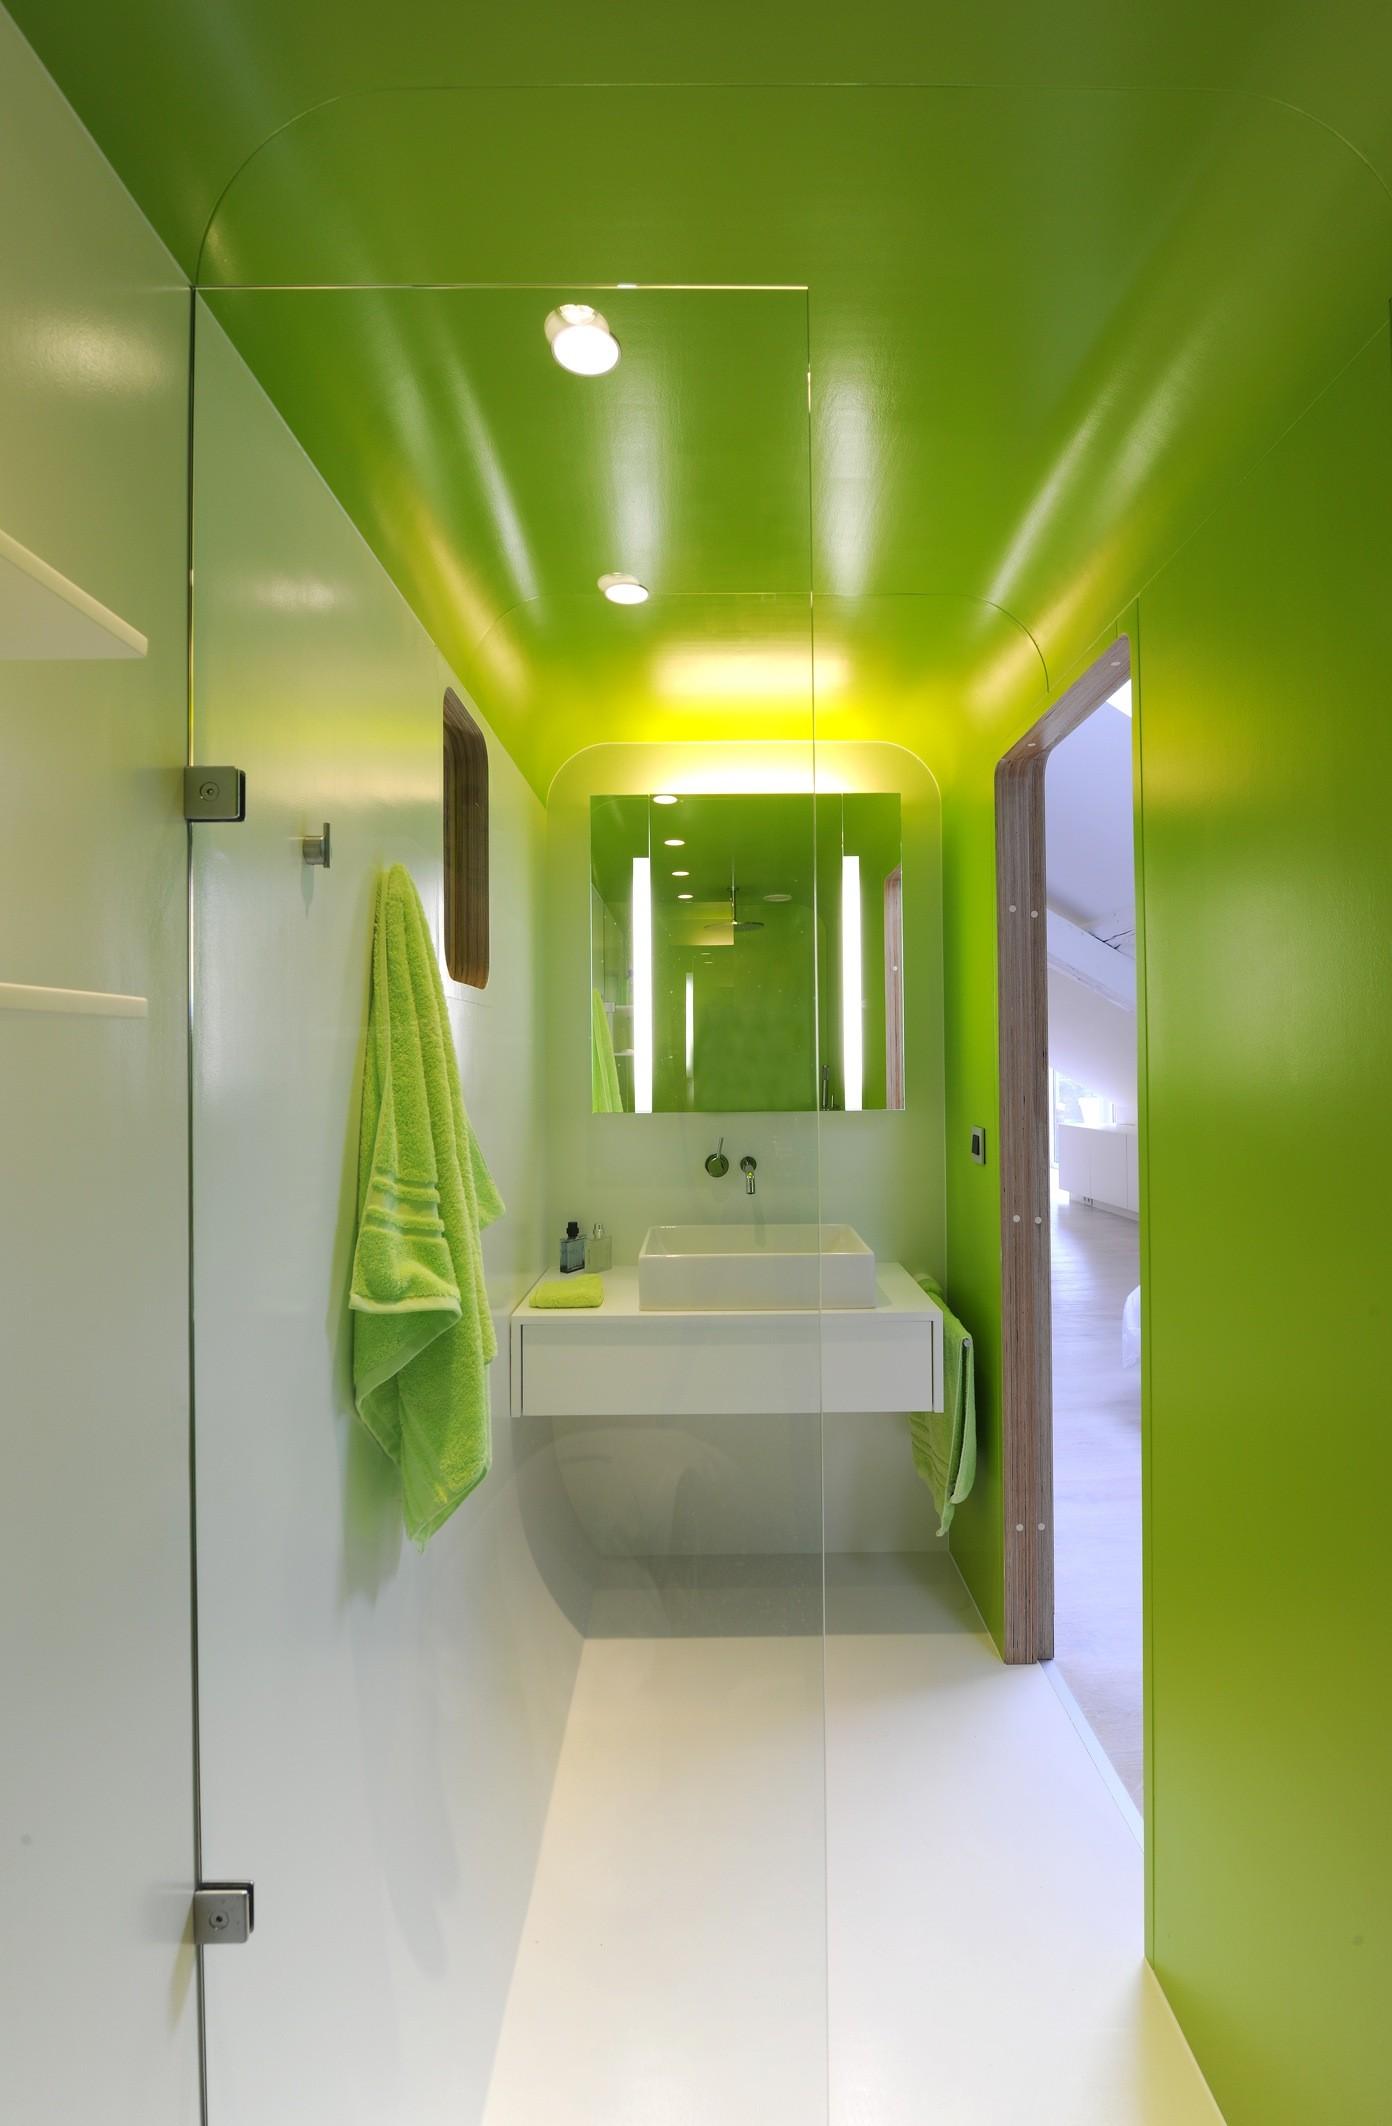 gallery of kempart loft dethier architectures 16. Black Bedroom Furniture Sets. Home Design Ideas